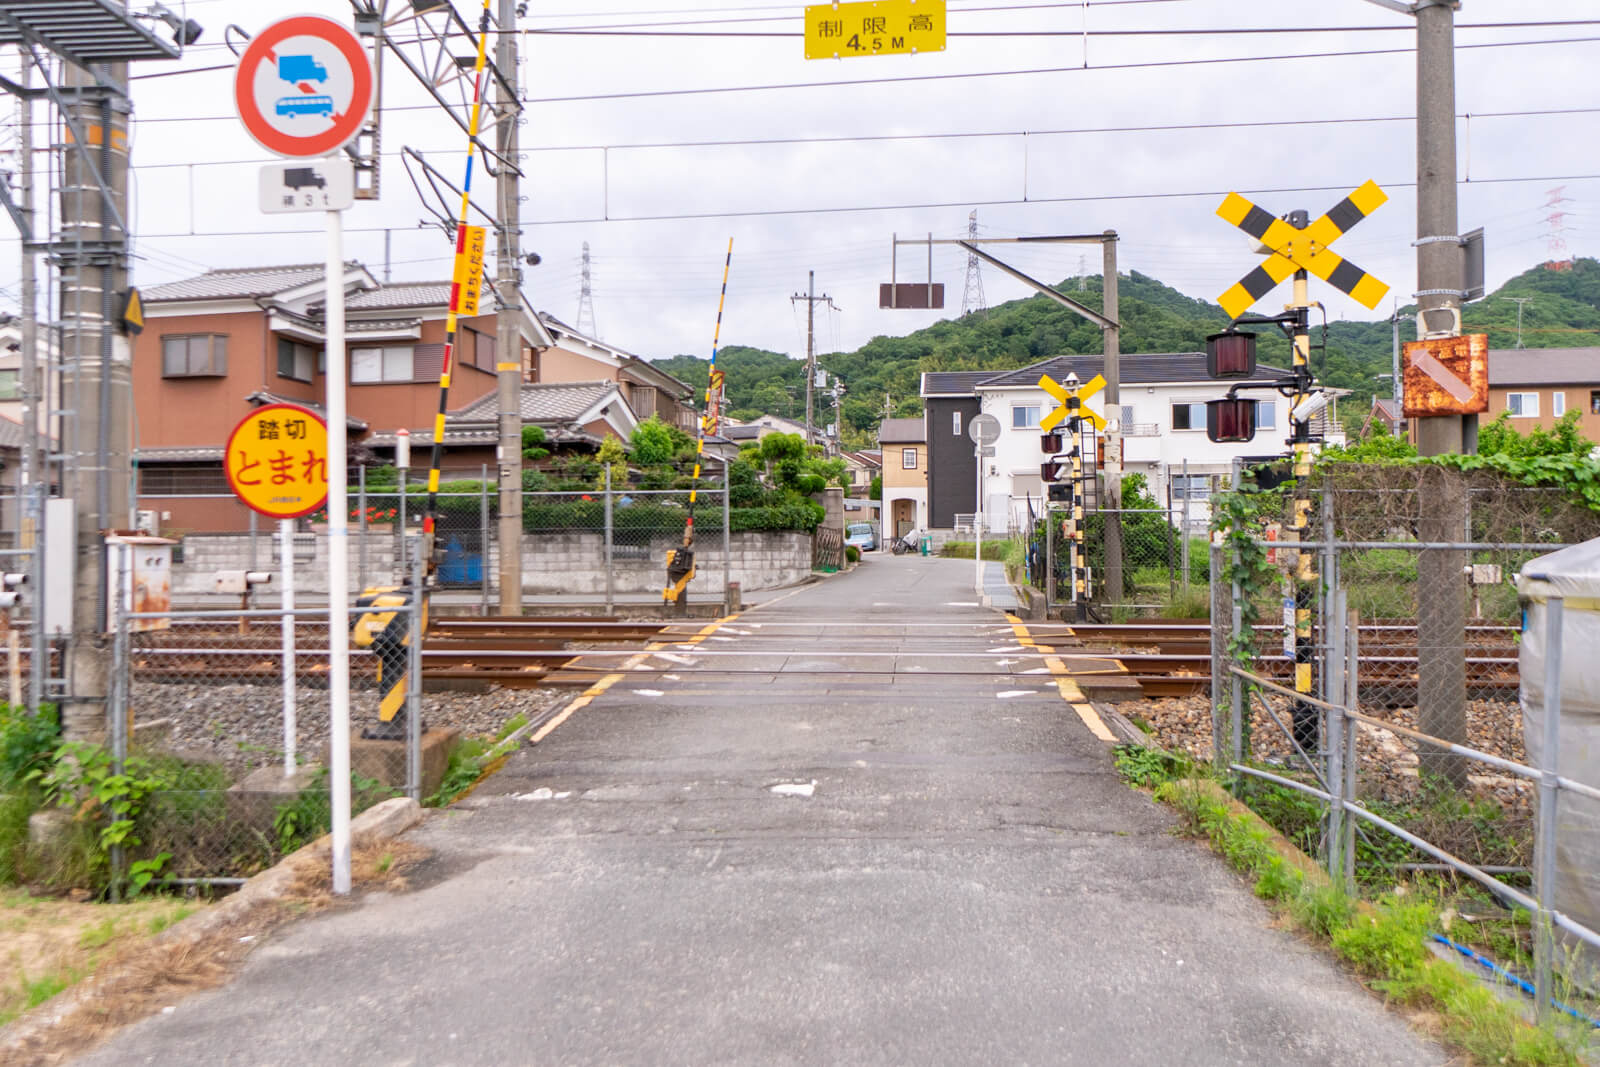 kuraji-61 (1)